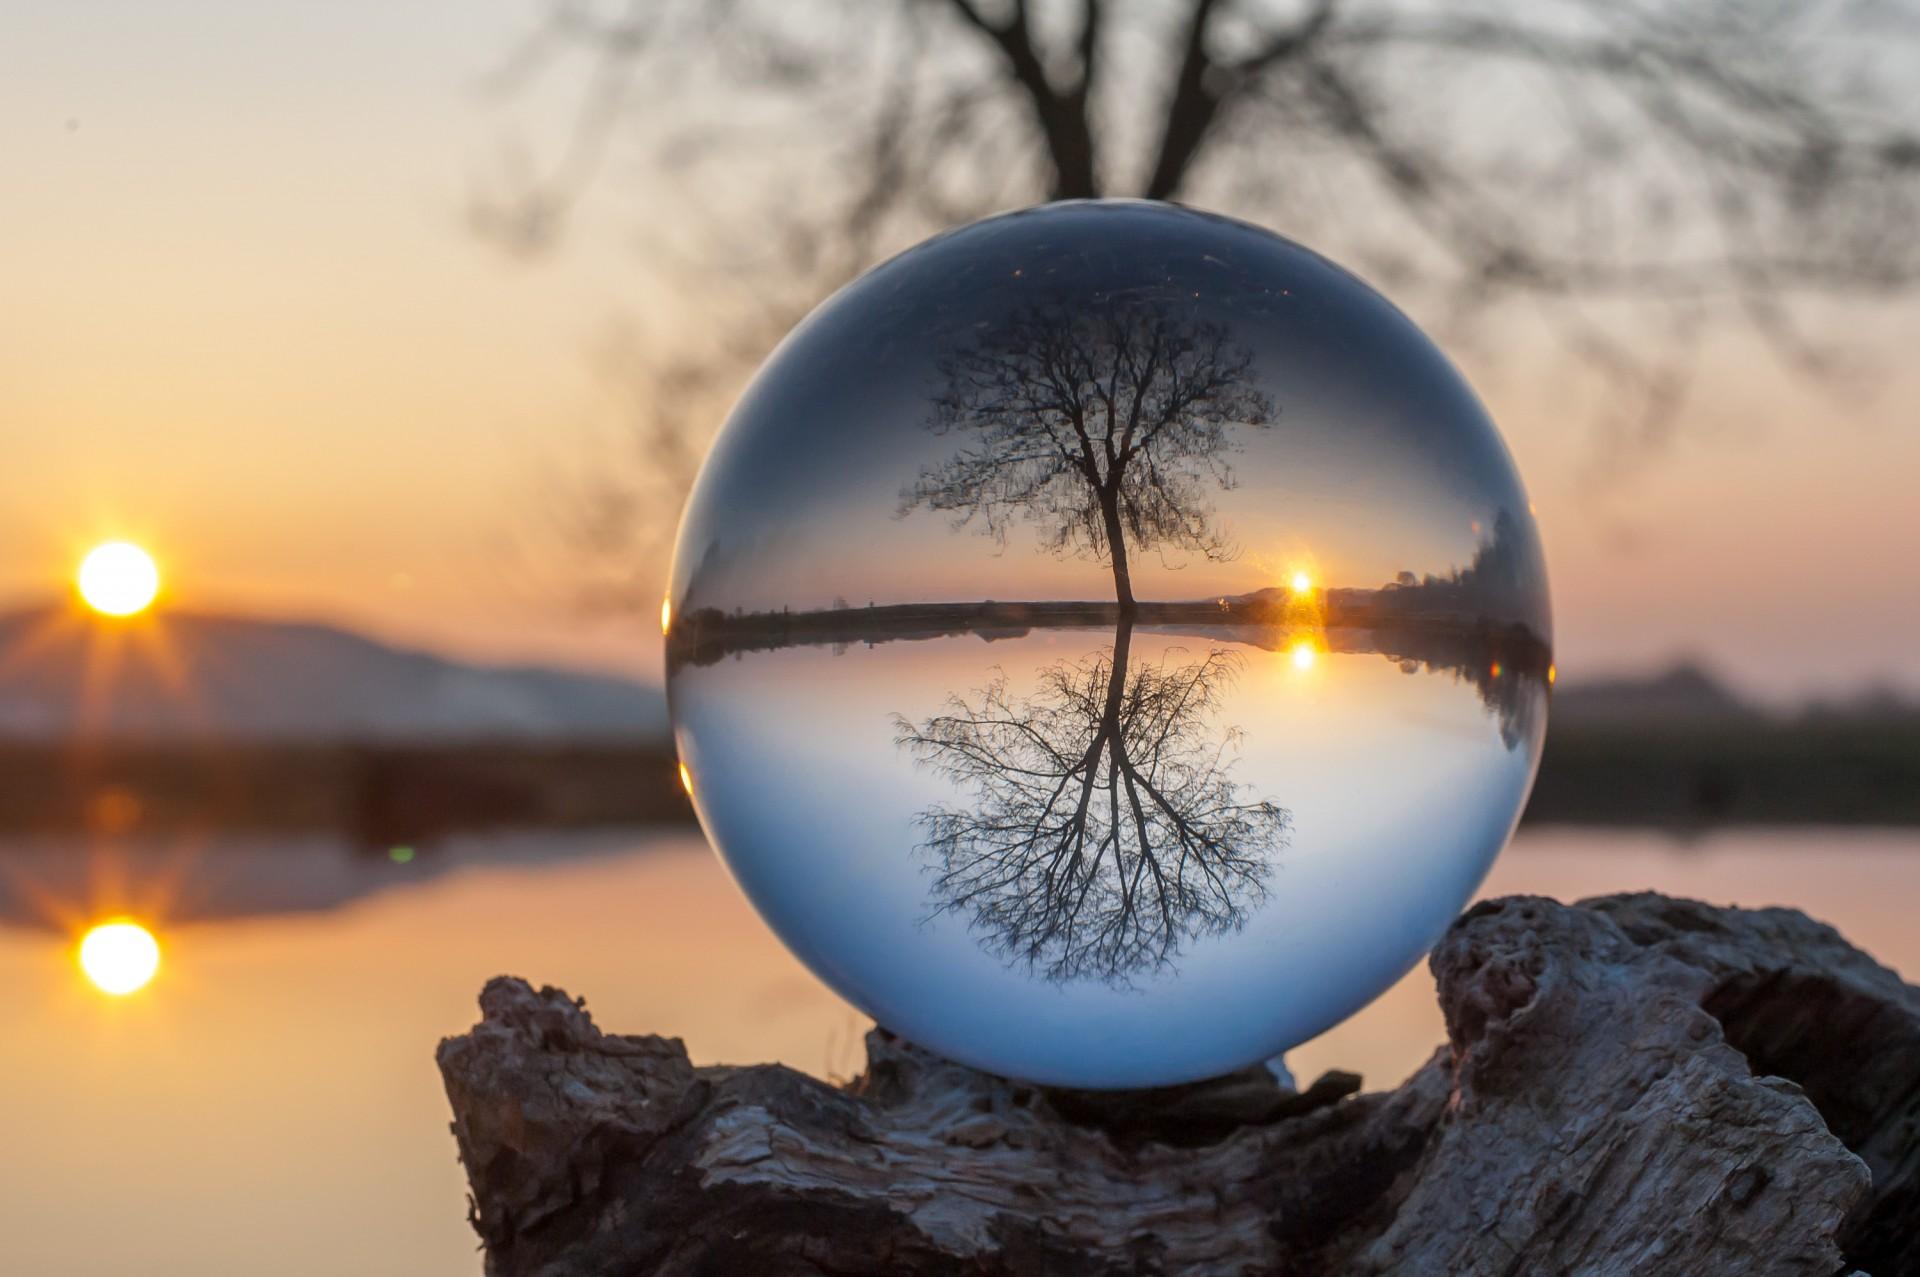 Buddha Hd Wallpaper 1080p Glass Ball Project Photographer Andrius Aleksandravičius